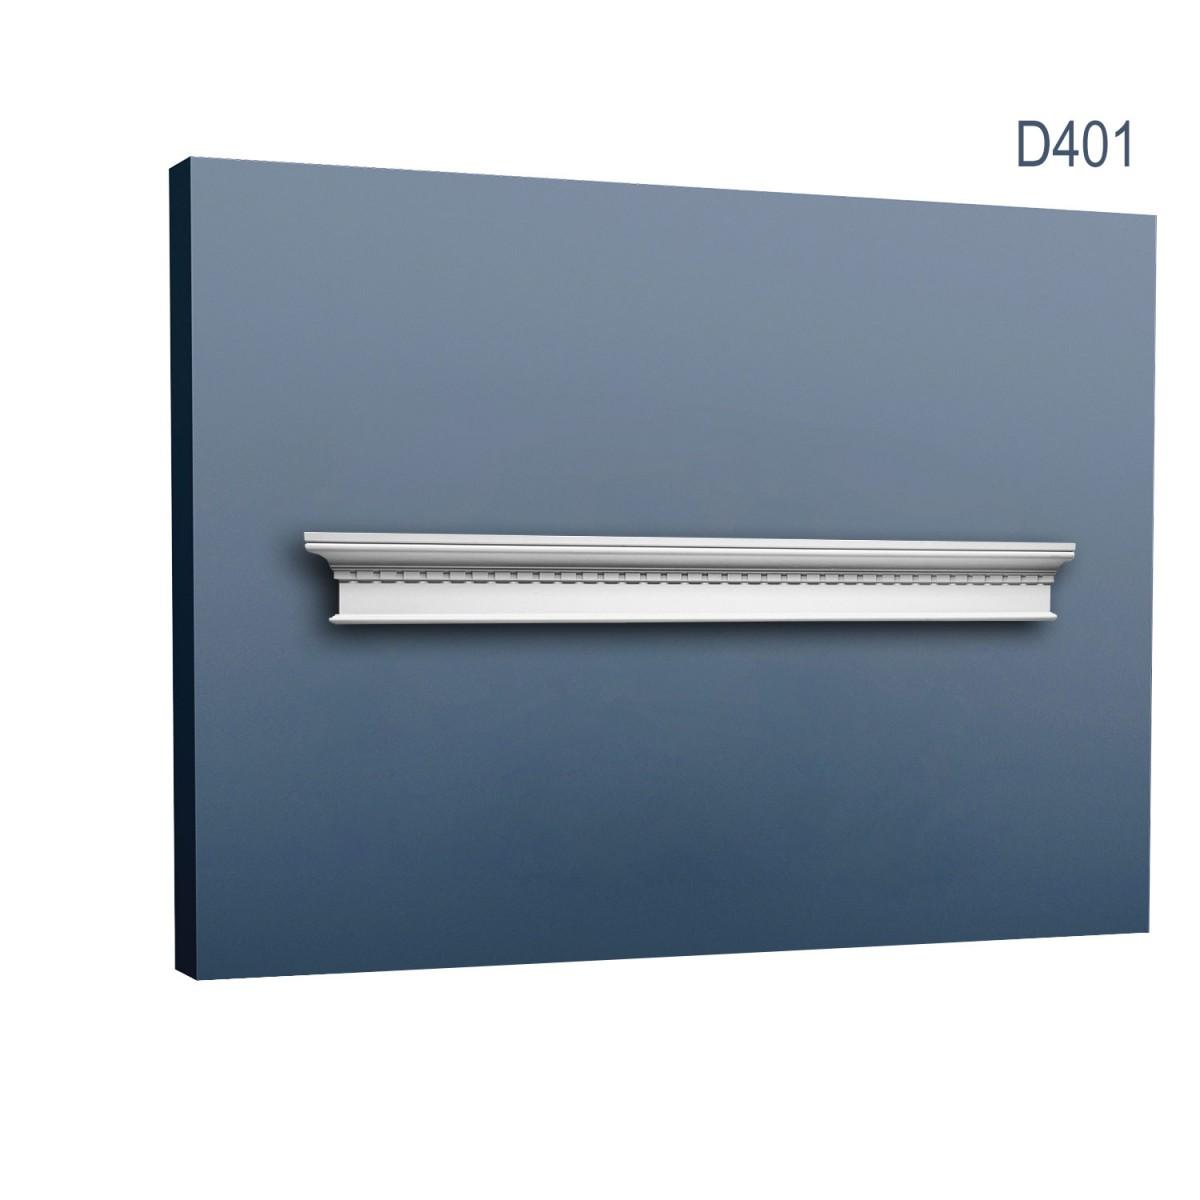 Fronton Luxxus D401, Dimensiuni: 127.5 X 14.7 X 5.9 cm, Orac Decor